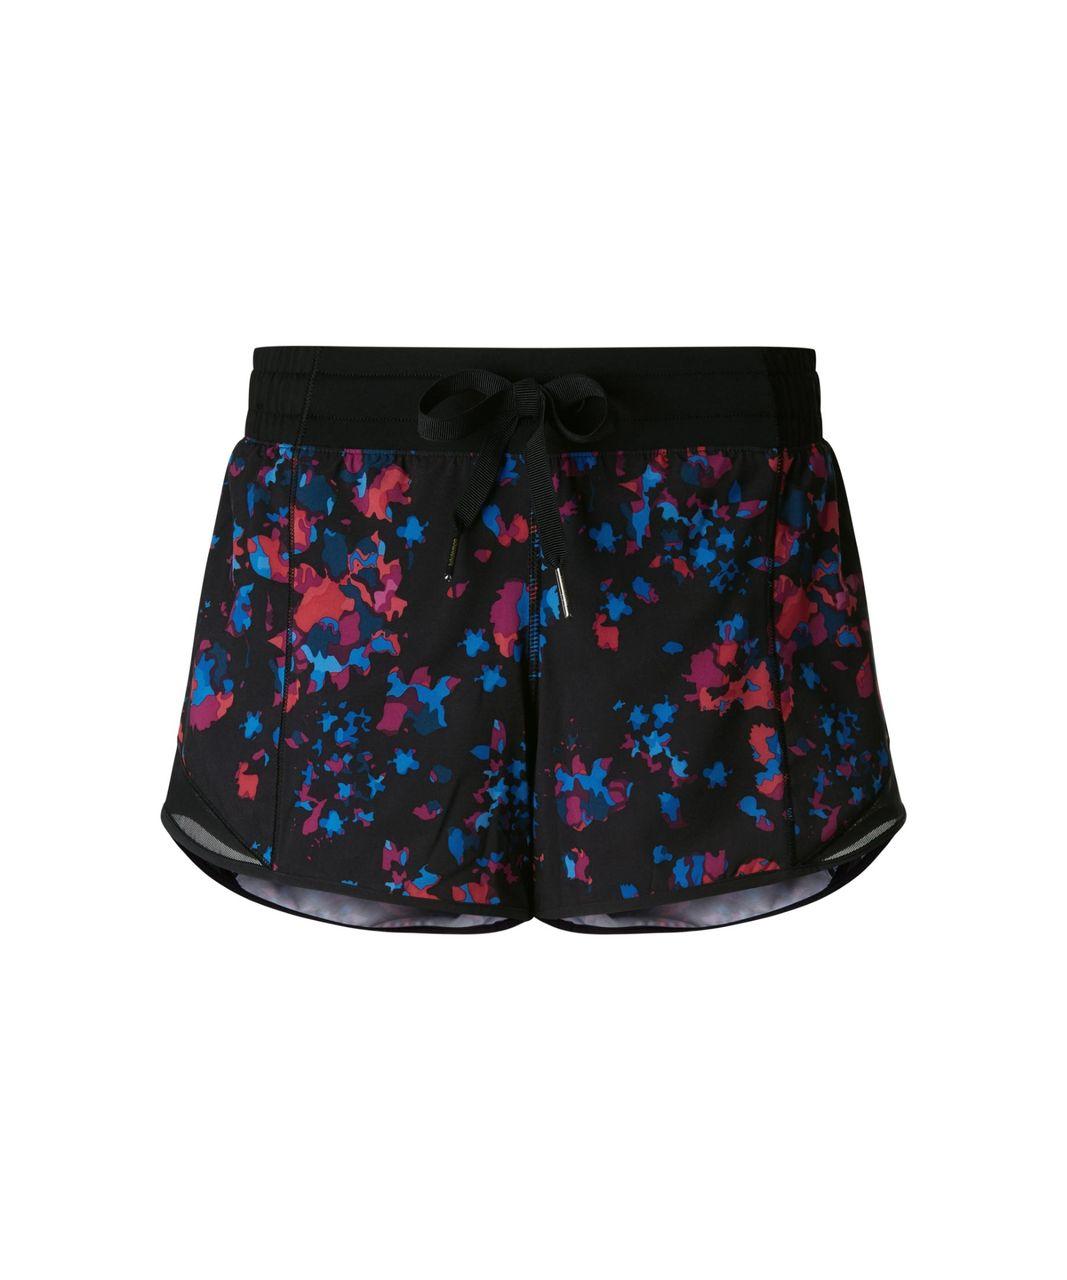 Lululemon Hotty Hot Short - Dandy Digie Multi / Black